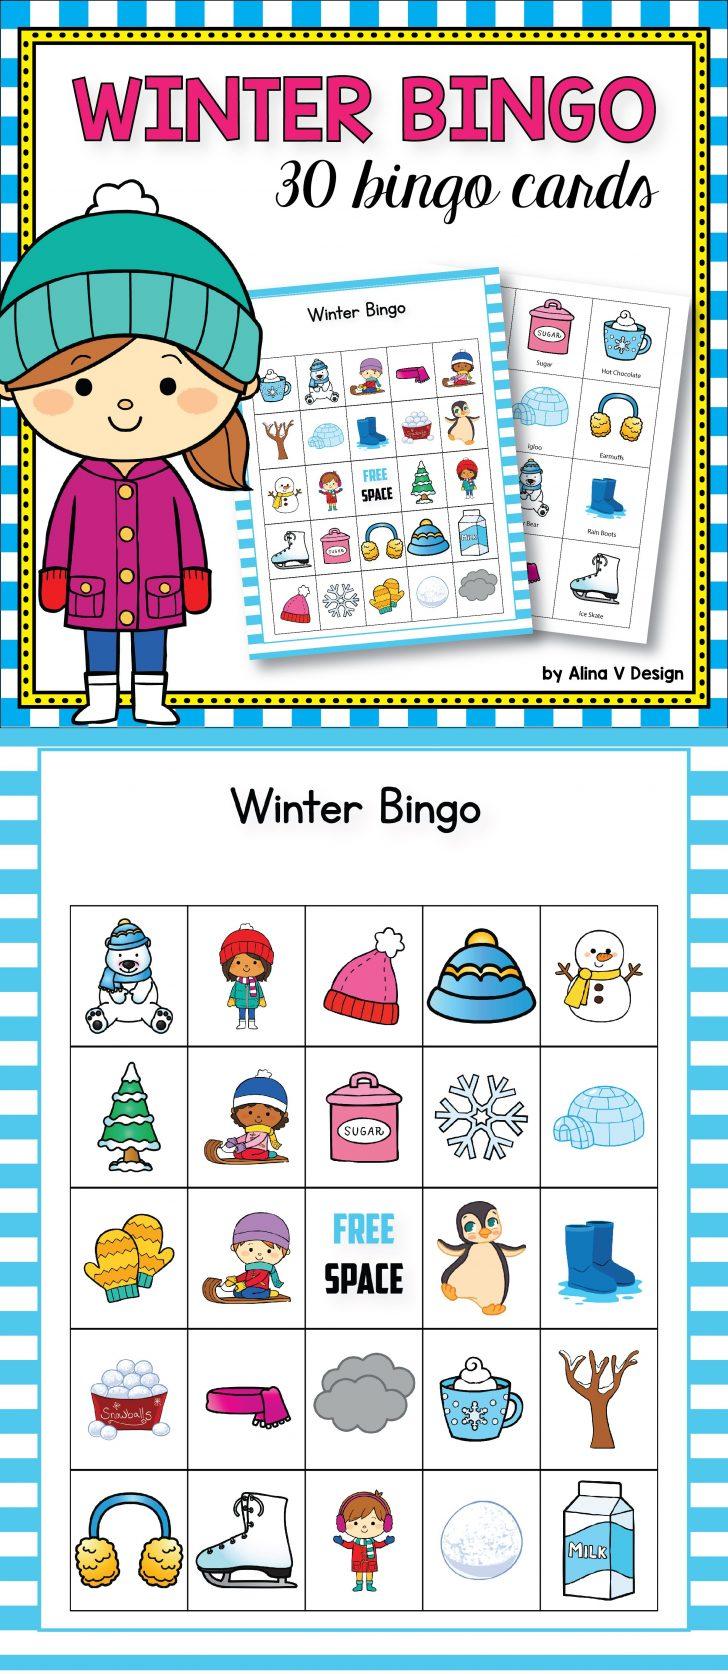 Printable Winter Bingo Cards